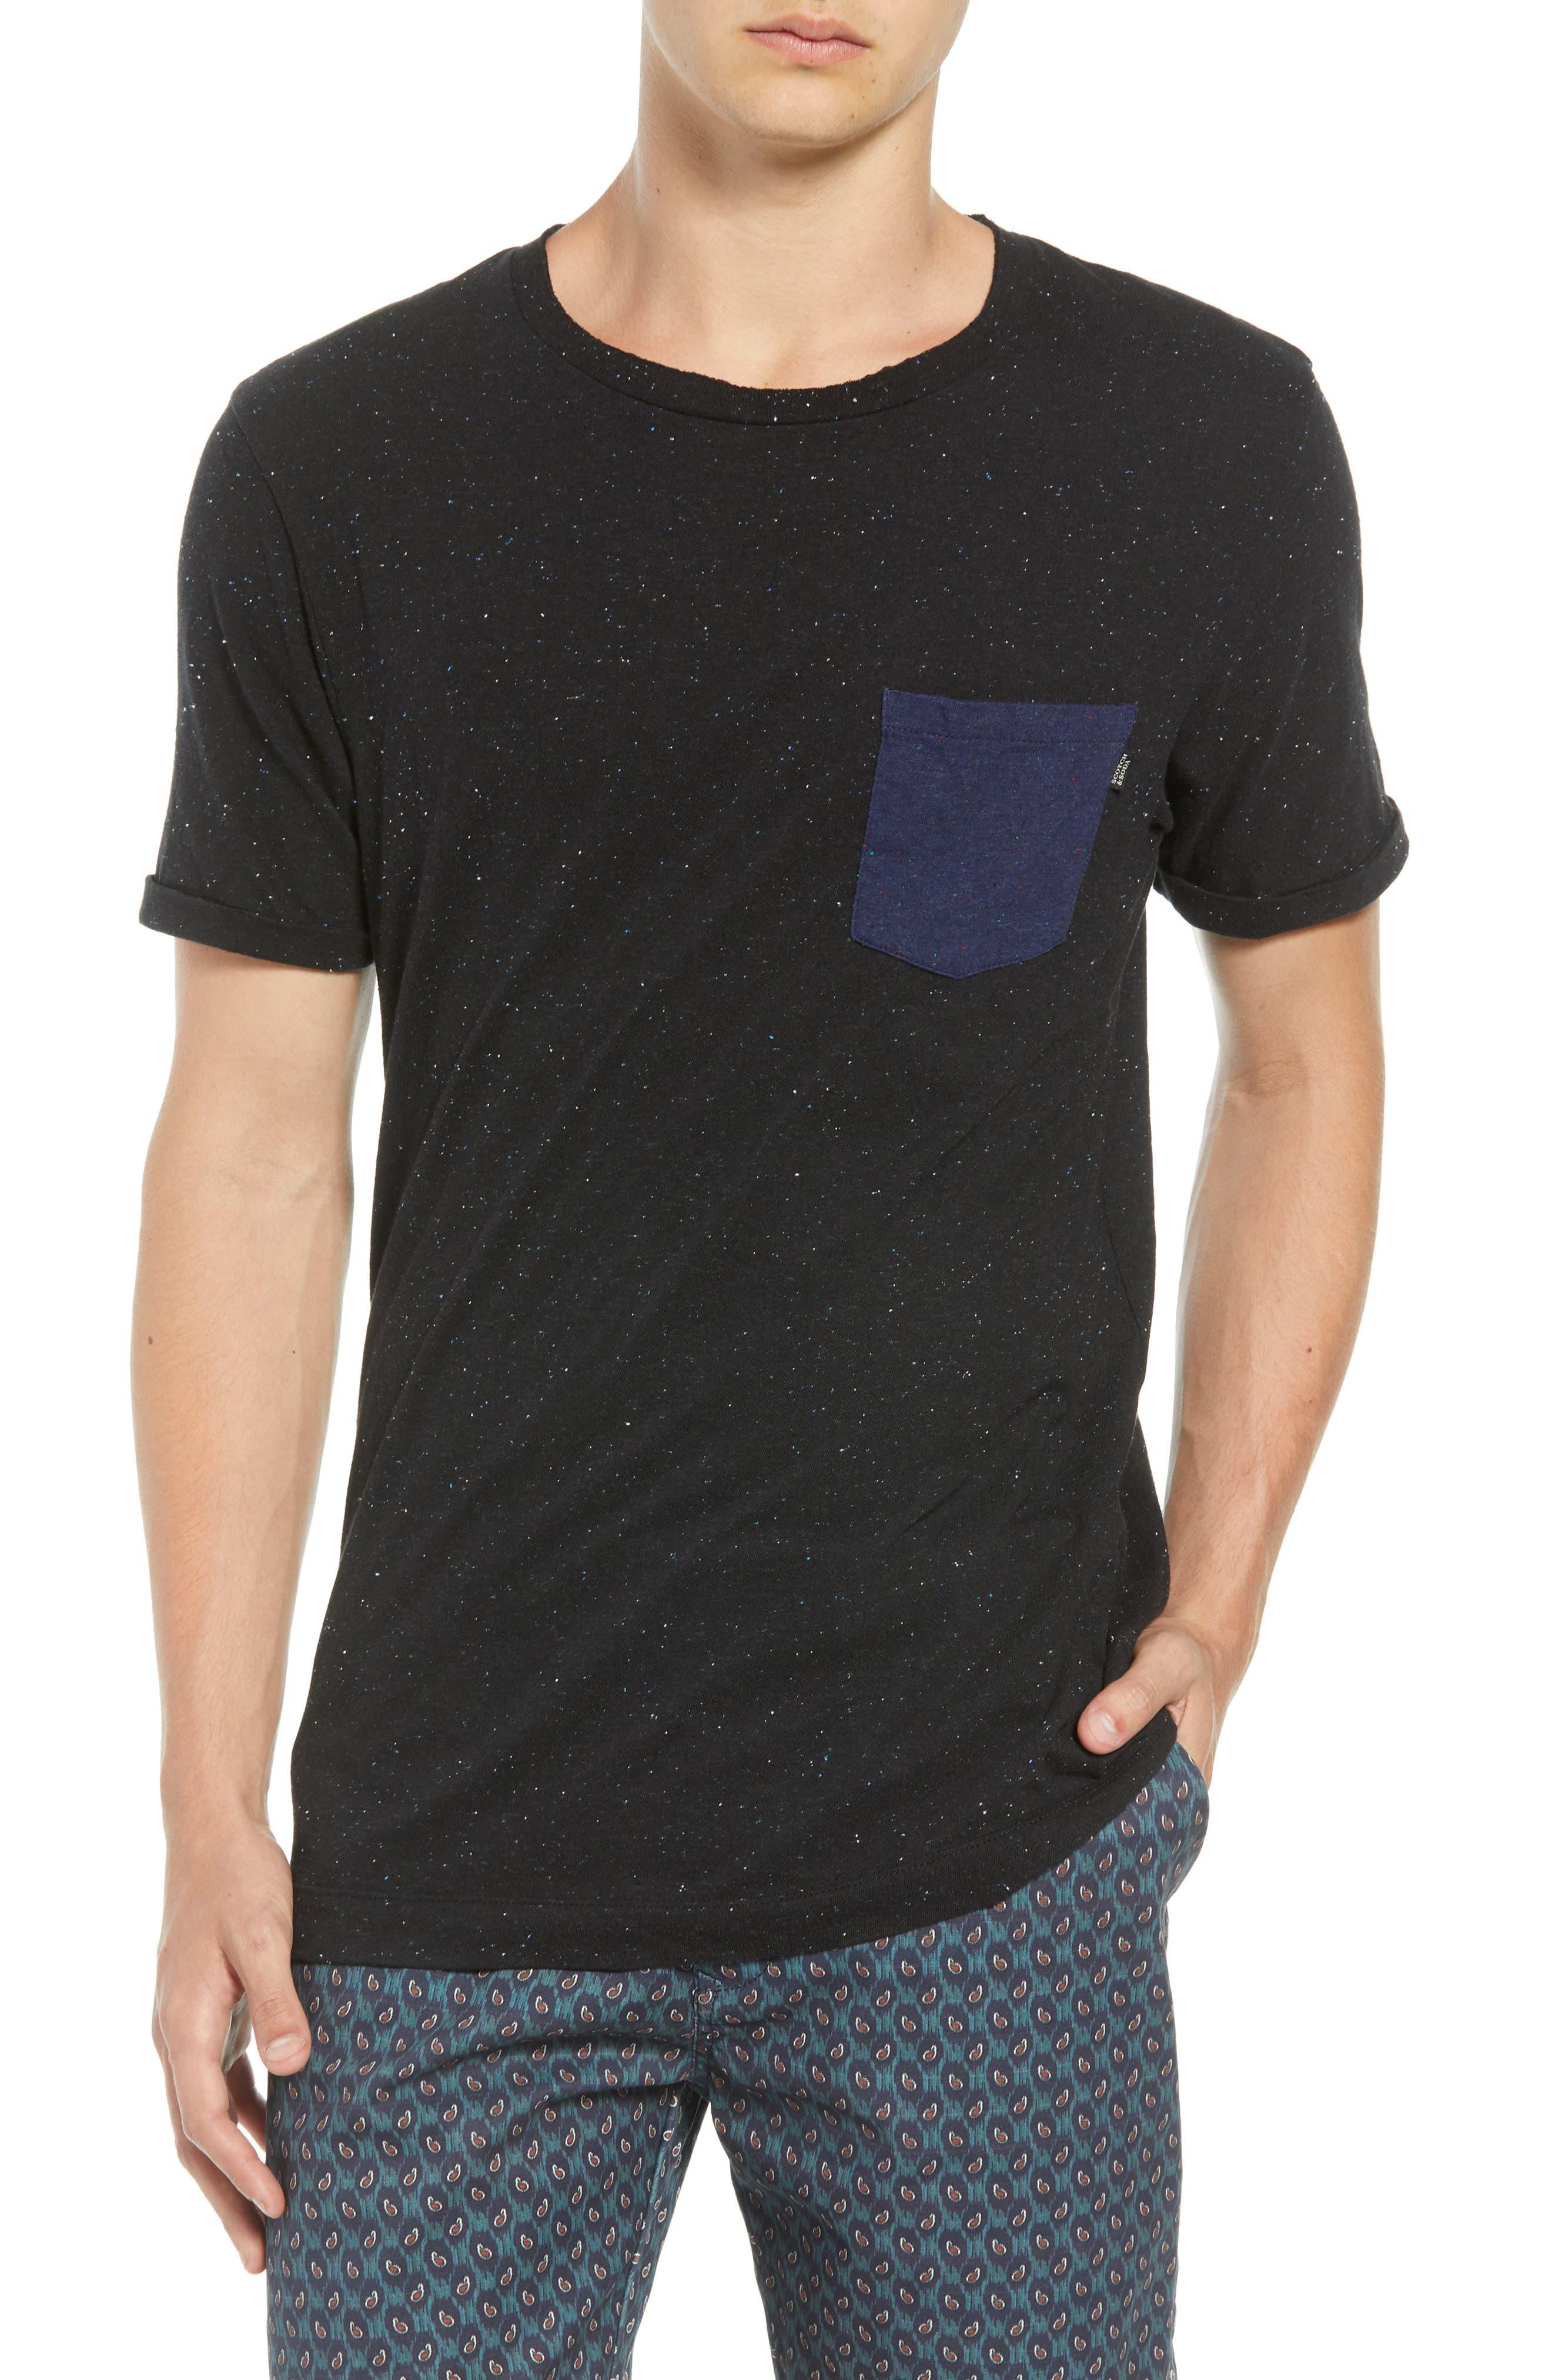 Nep Jersey Pocket T-Shirt,                             Main thumbnail 1, color,                             BLACK MELANGE